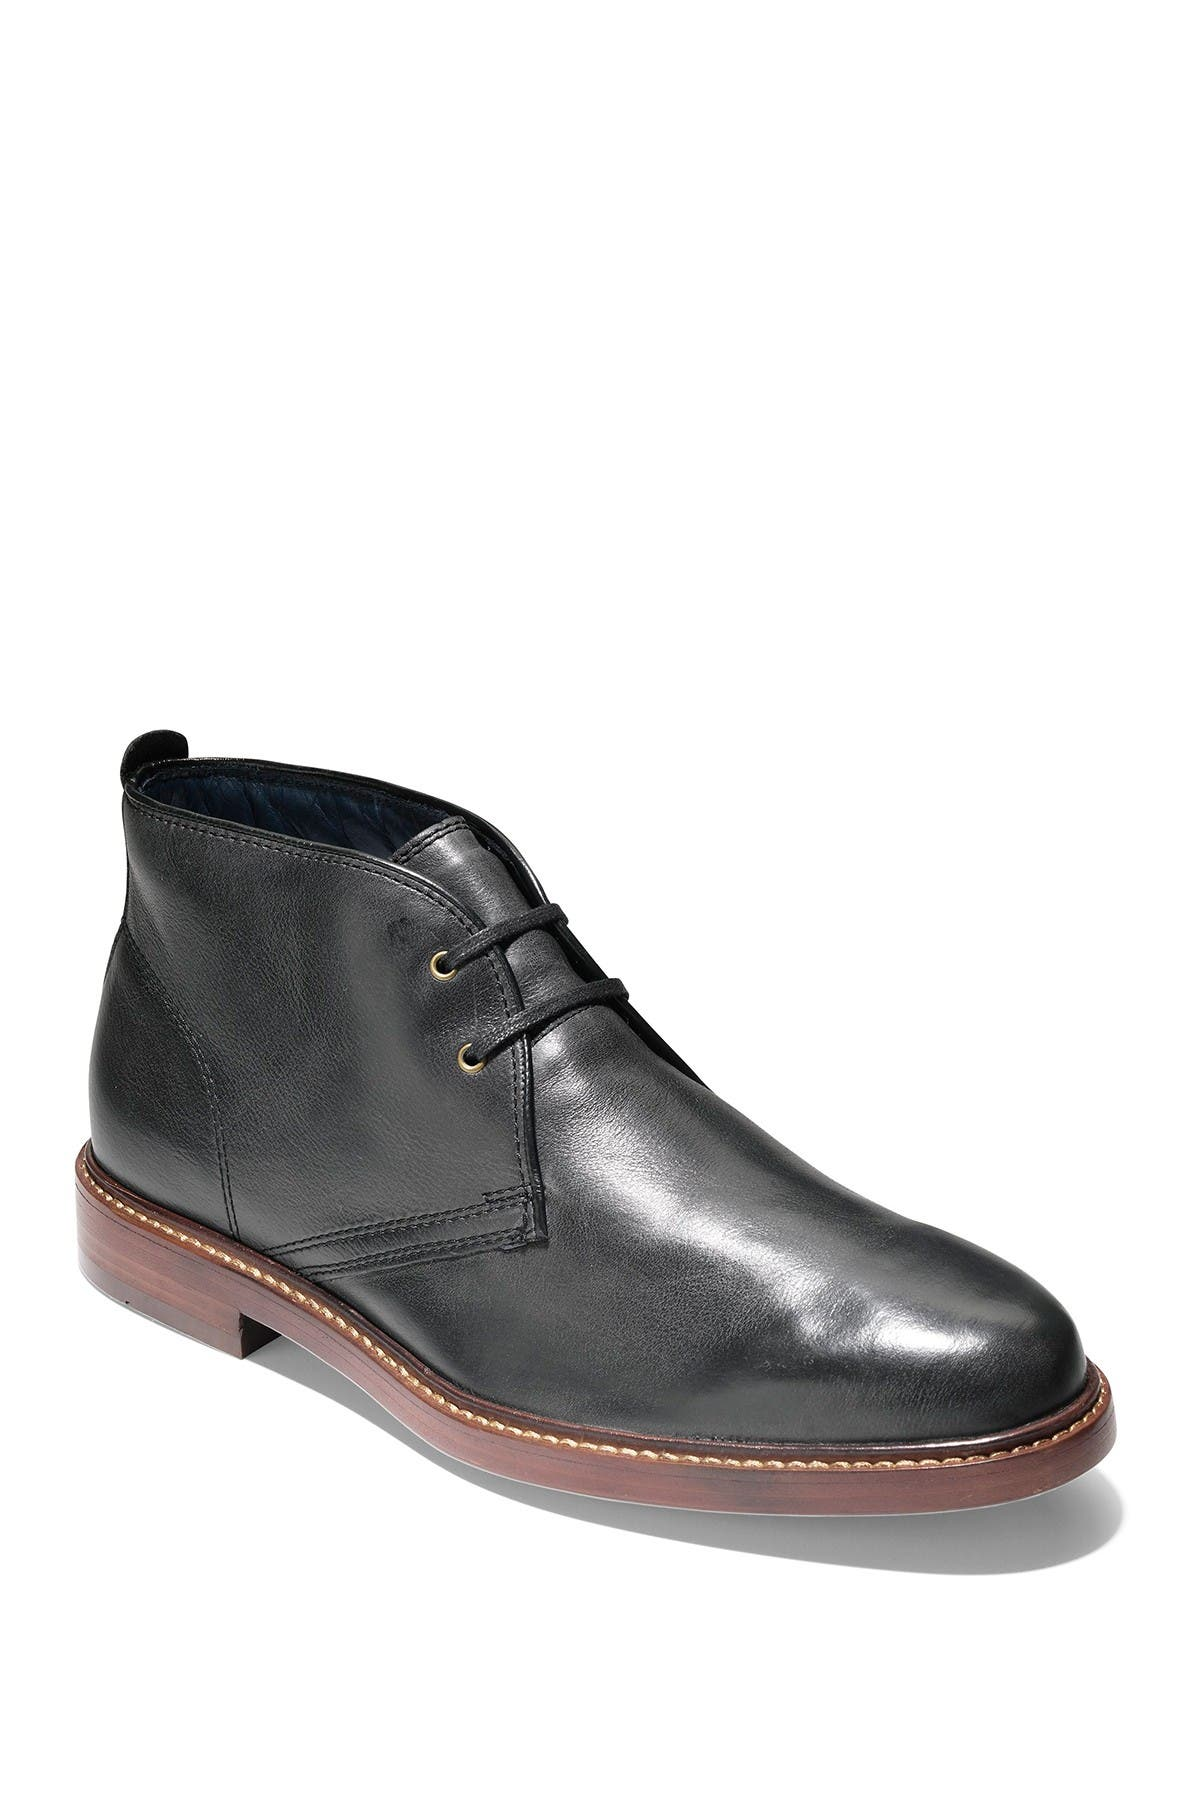 Image of Cole Haan Tyler Leather Chukka Boot